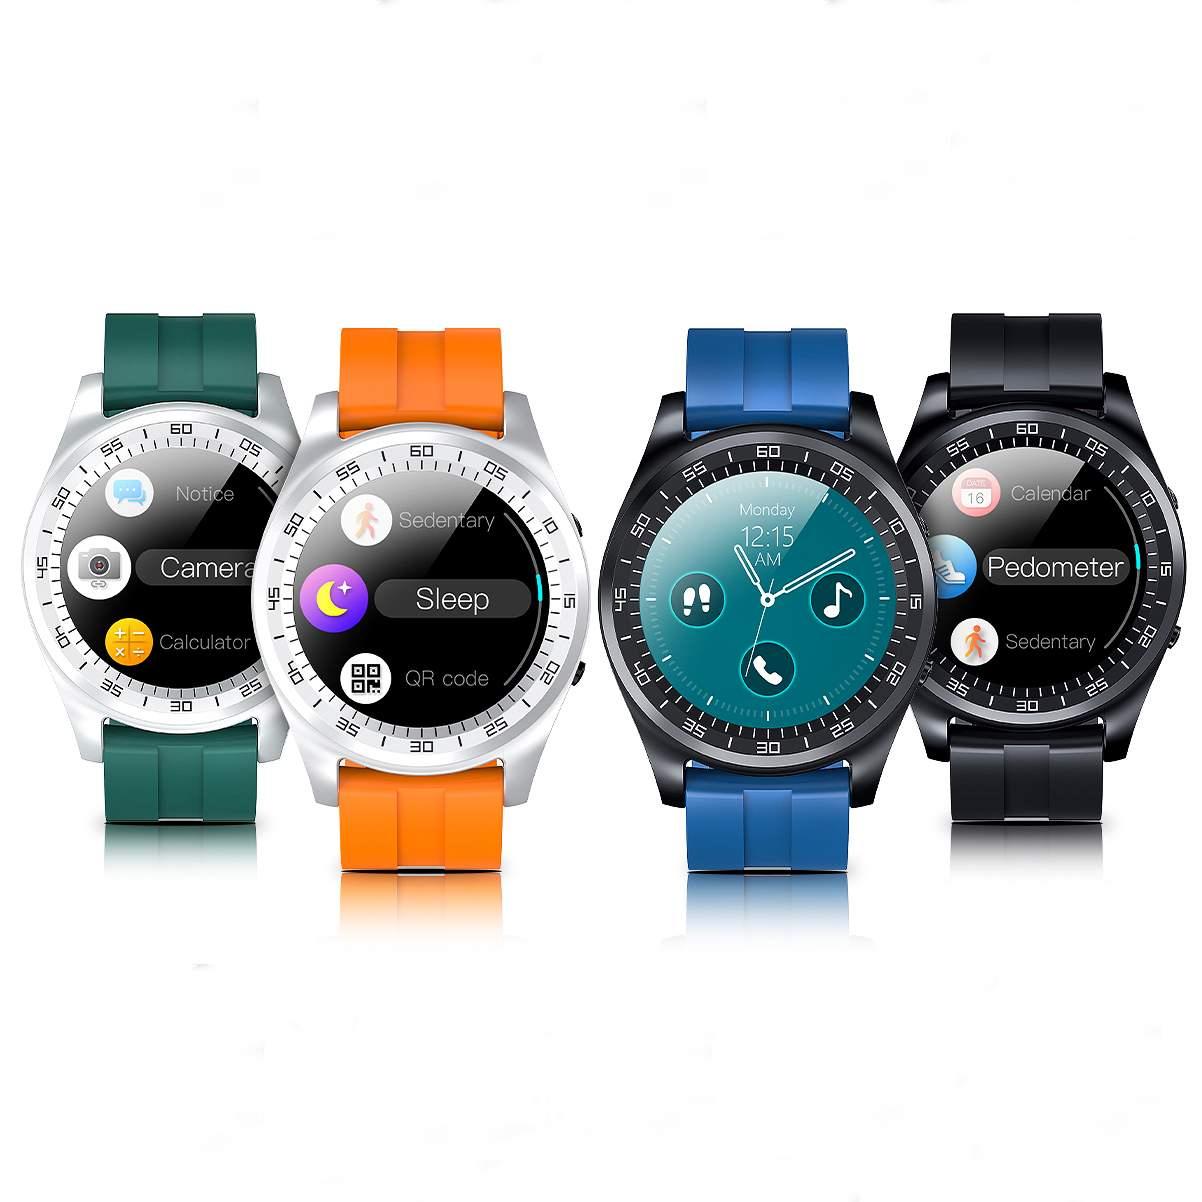 Reloj inteligente con pantalla táctil Bakeey T20 de 1,3 pulgadas, micro-SIM de llamada bluetooth, tarjeta TF, cámara de música, Control de teléfono